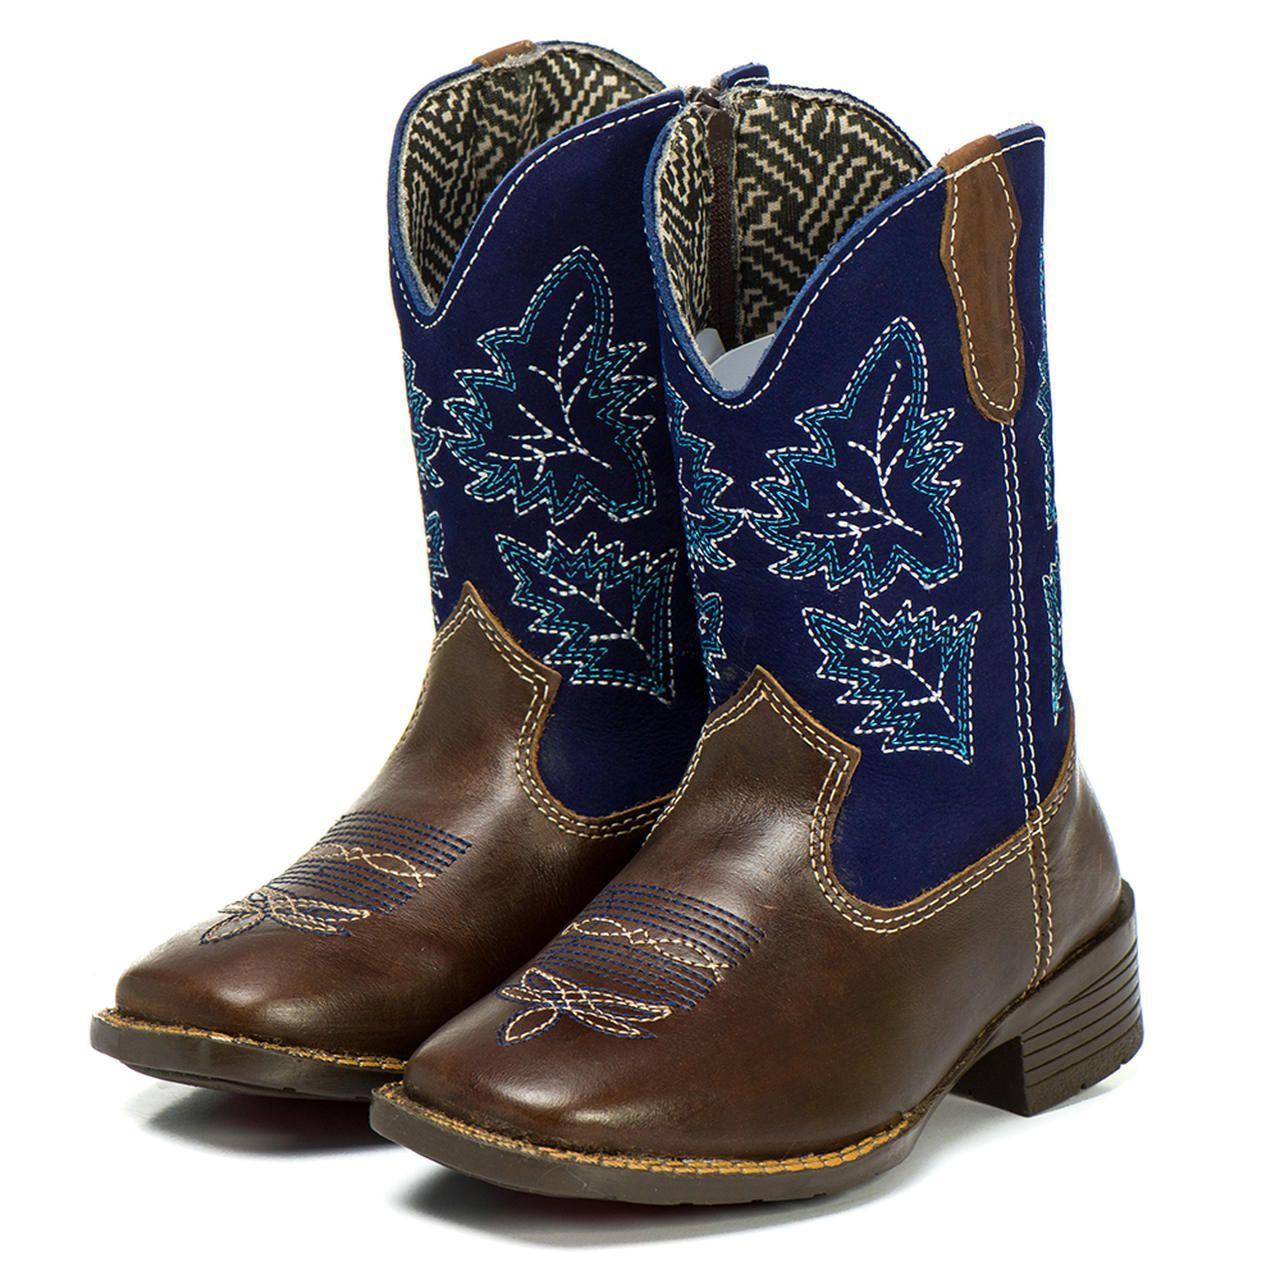 3cd90fb14 Bota Country Texana Infantil Azul Masculina Menino Couro - Kapell ...